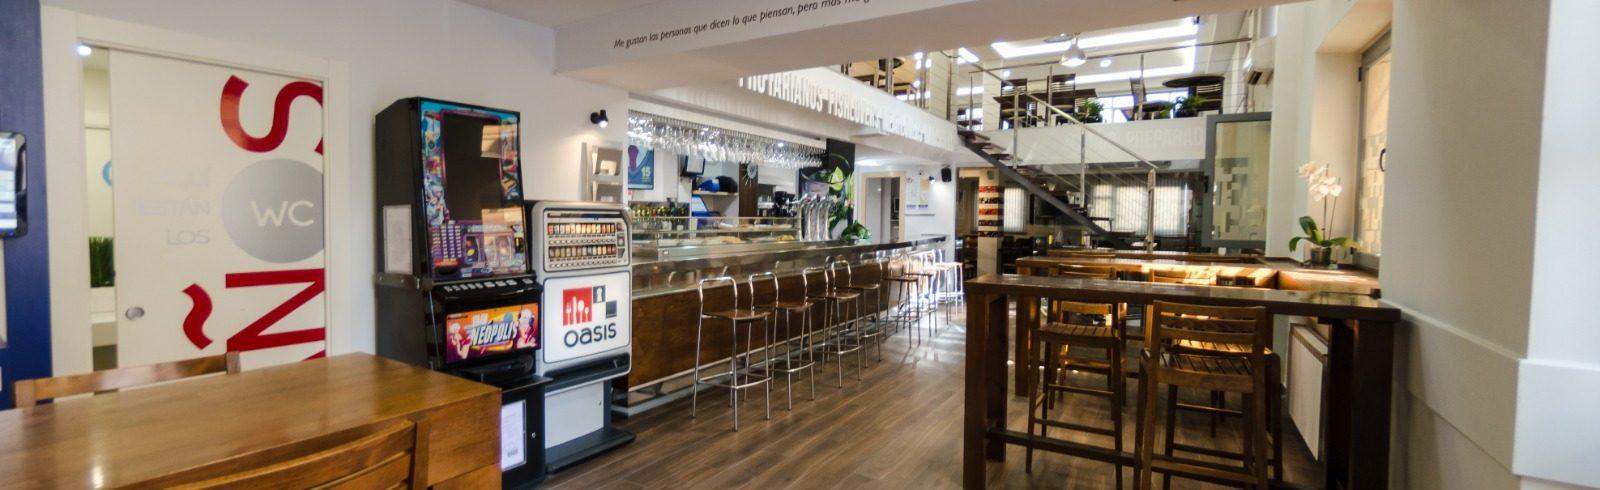 oasis zamora restaurante _hostal (39)